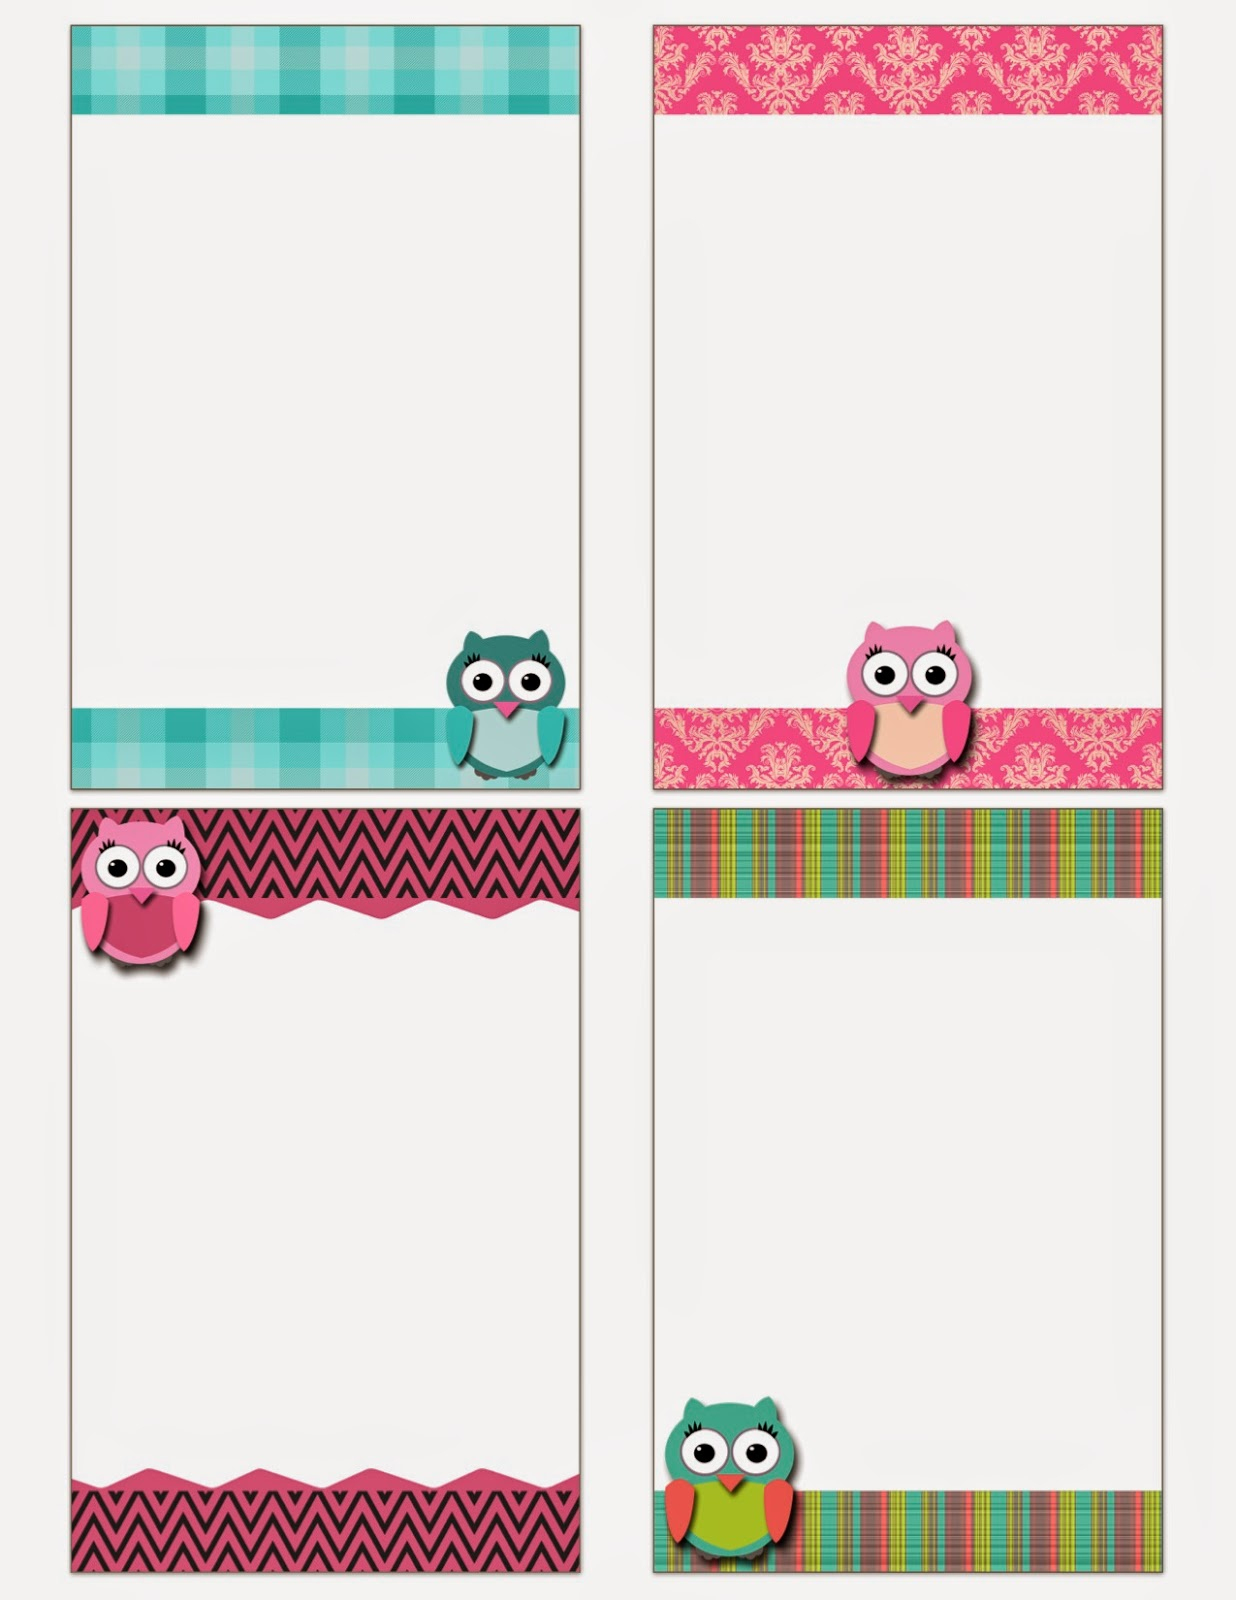 My Fashionable Designs: Free Printable: Owl Notecards - Free Printable Note Cards